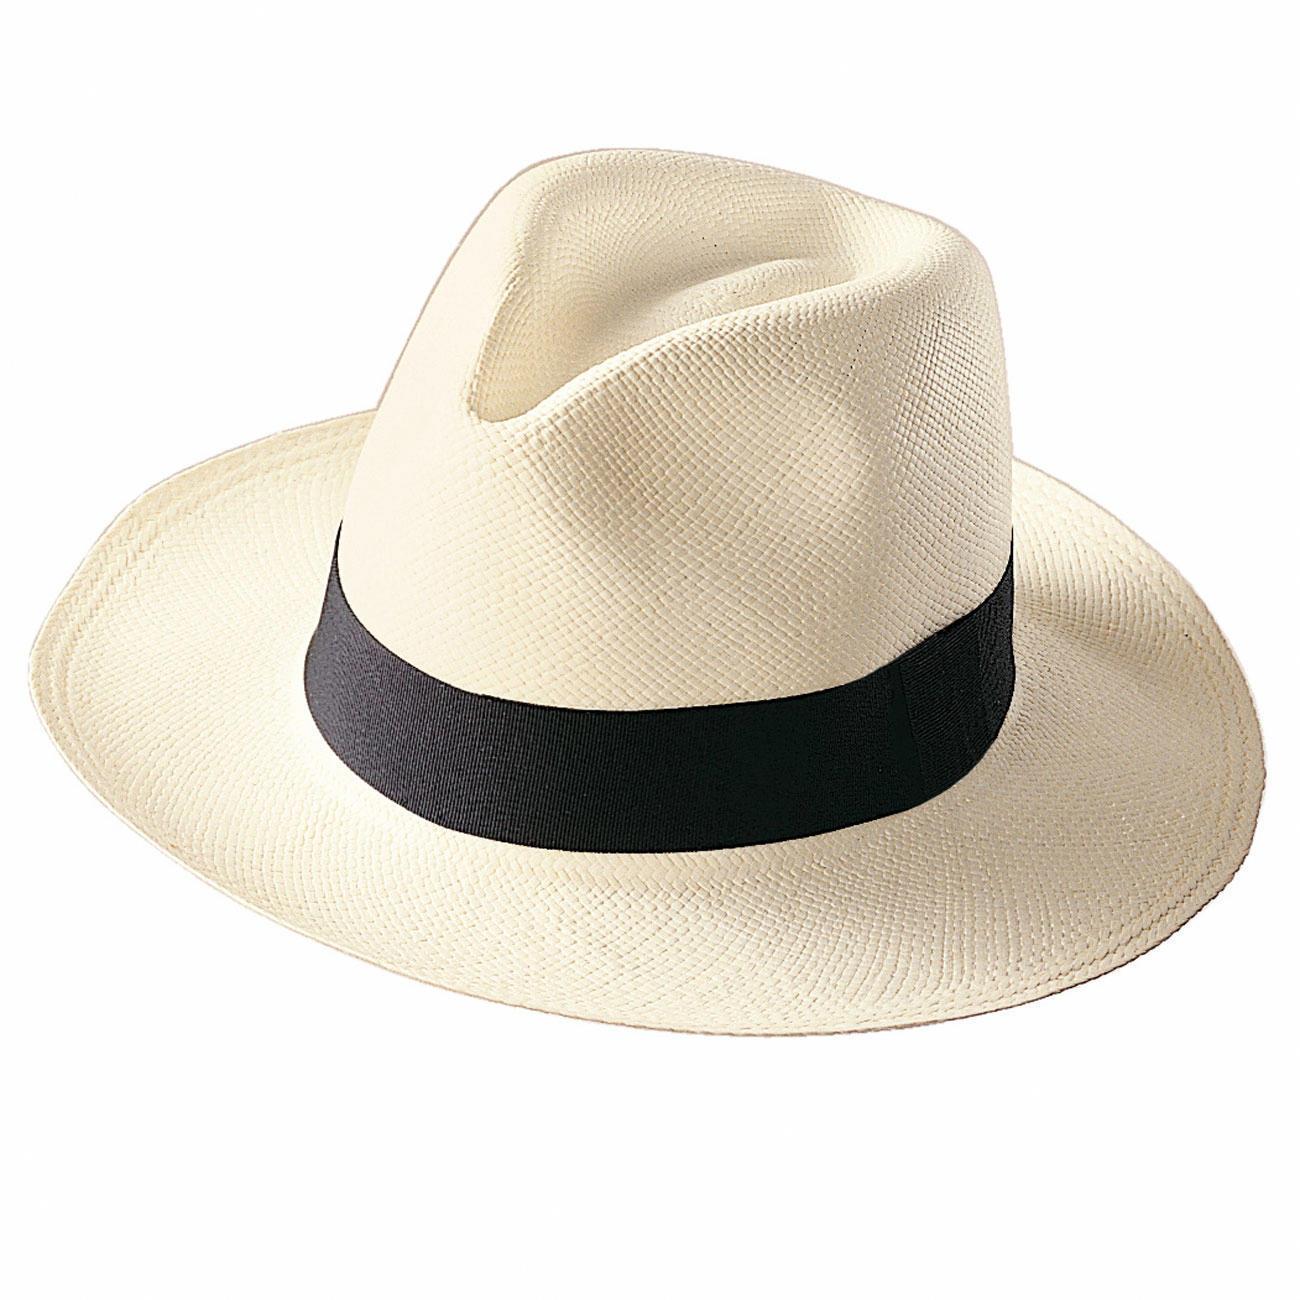 Design A Hat Panama Hut 3 Jahre Garantie Pro Idee